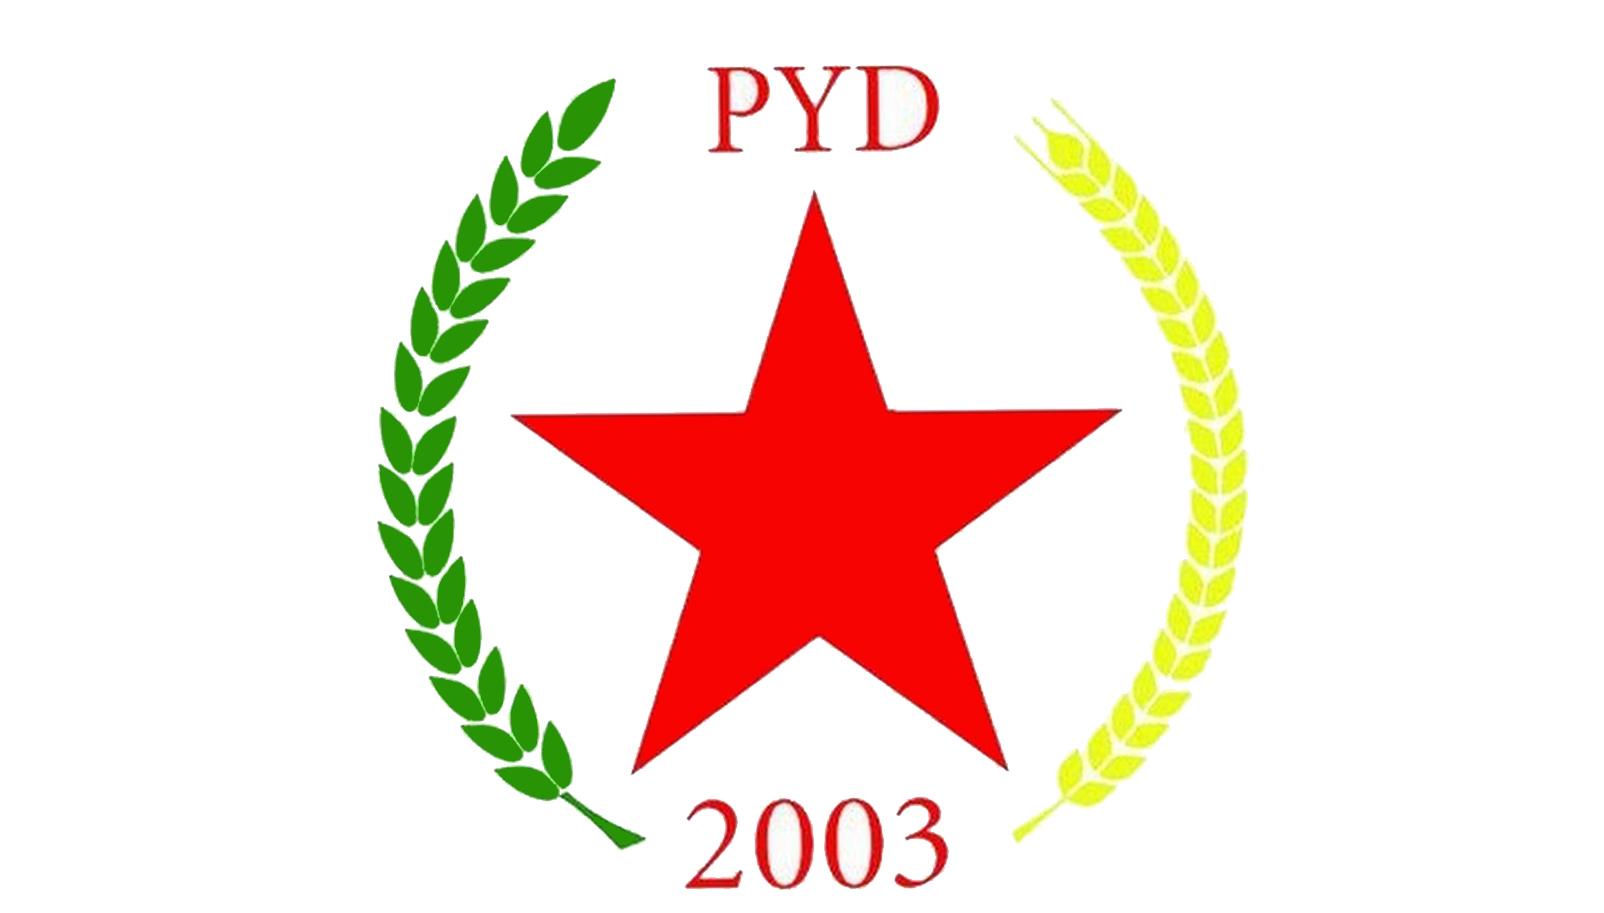 Drapeau du PYD.